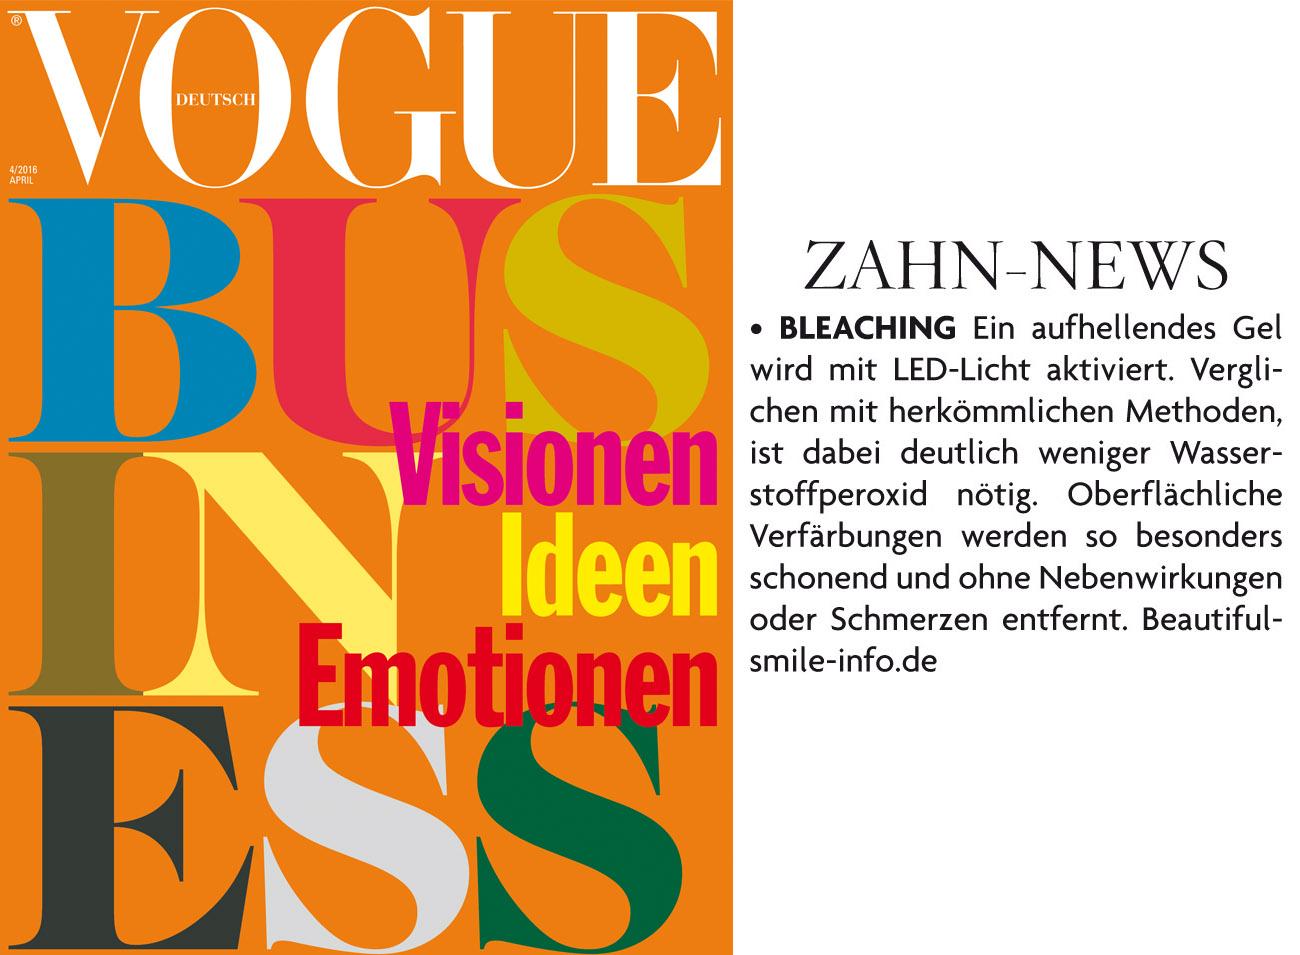 Vogue Business 09.03.2016